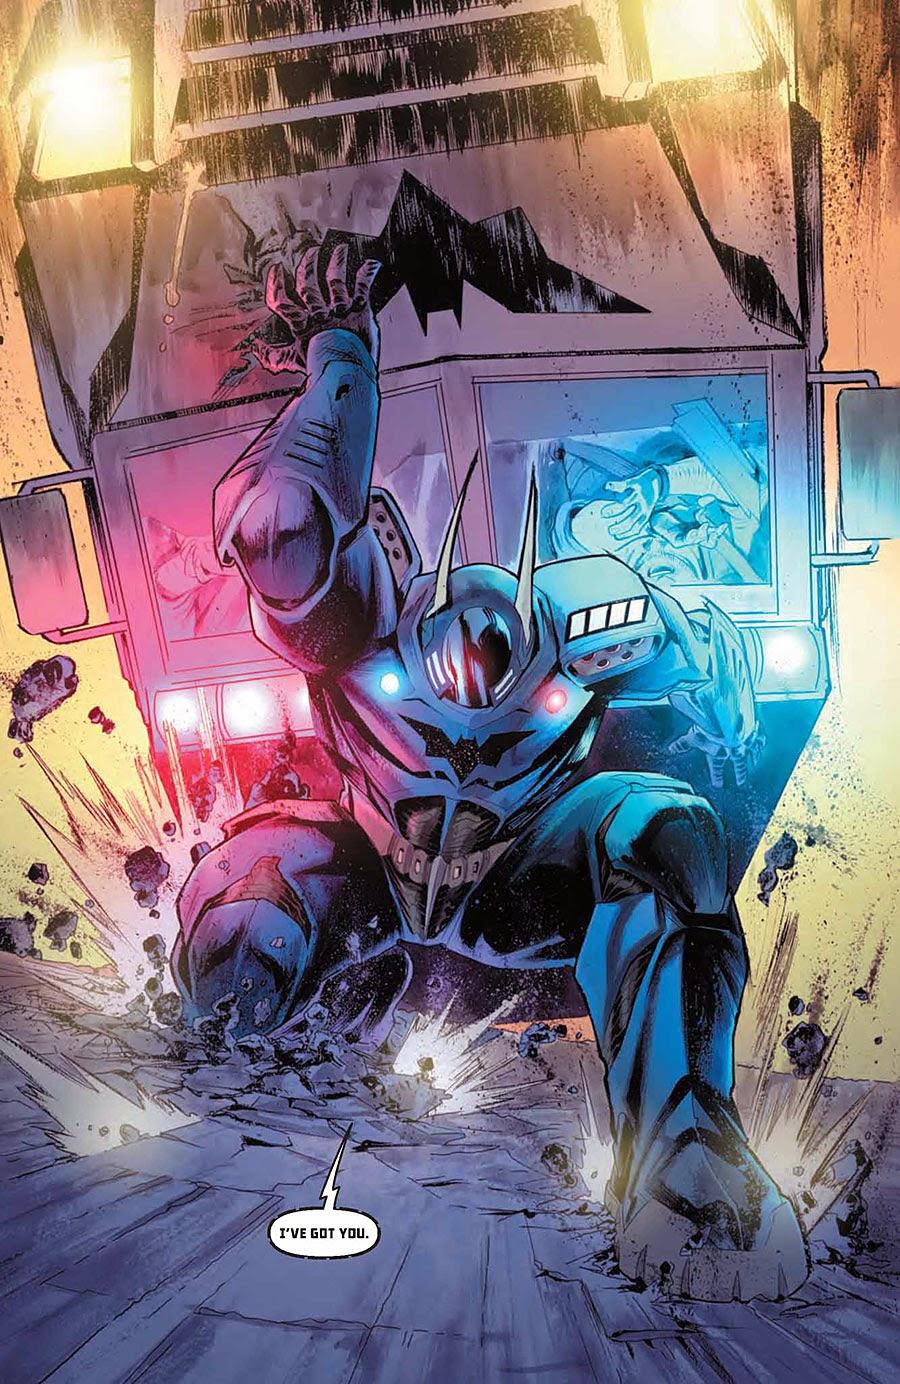 [Batman USA] - Notícias diversas do Morcego !!! - Página 2 DTC-950-dyluxlo-res-crop-Page-5-2048-554913ff3d25d6-71176849-7015d